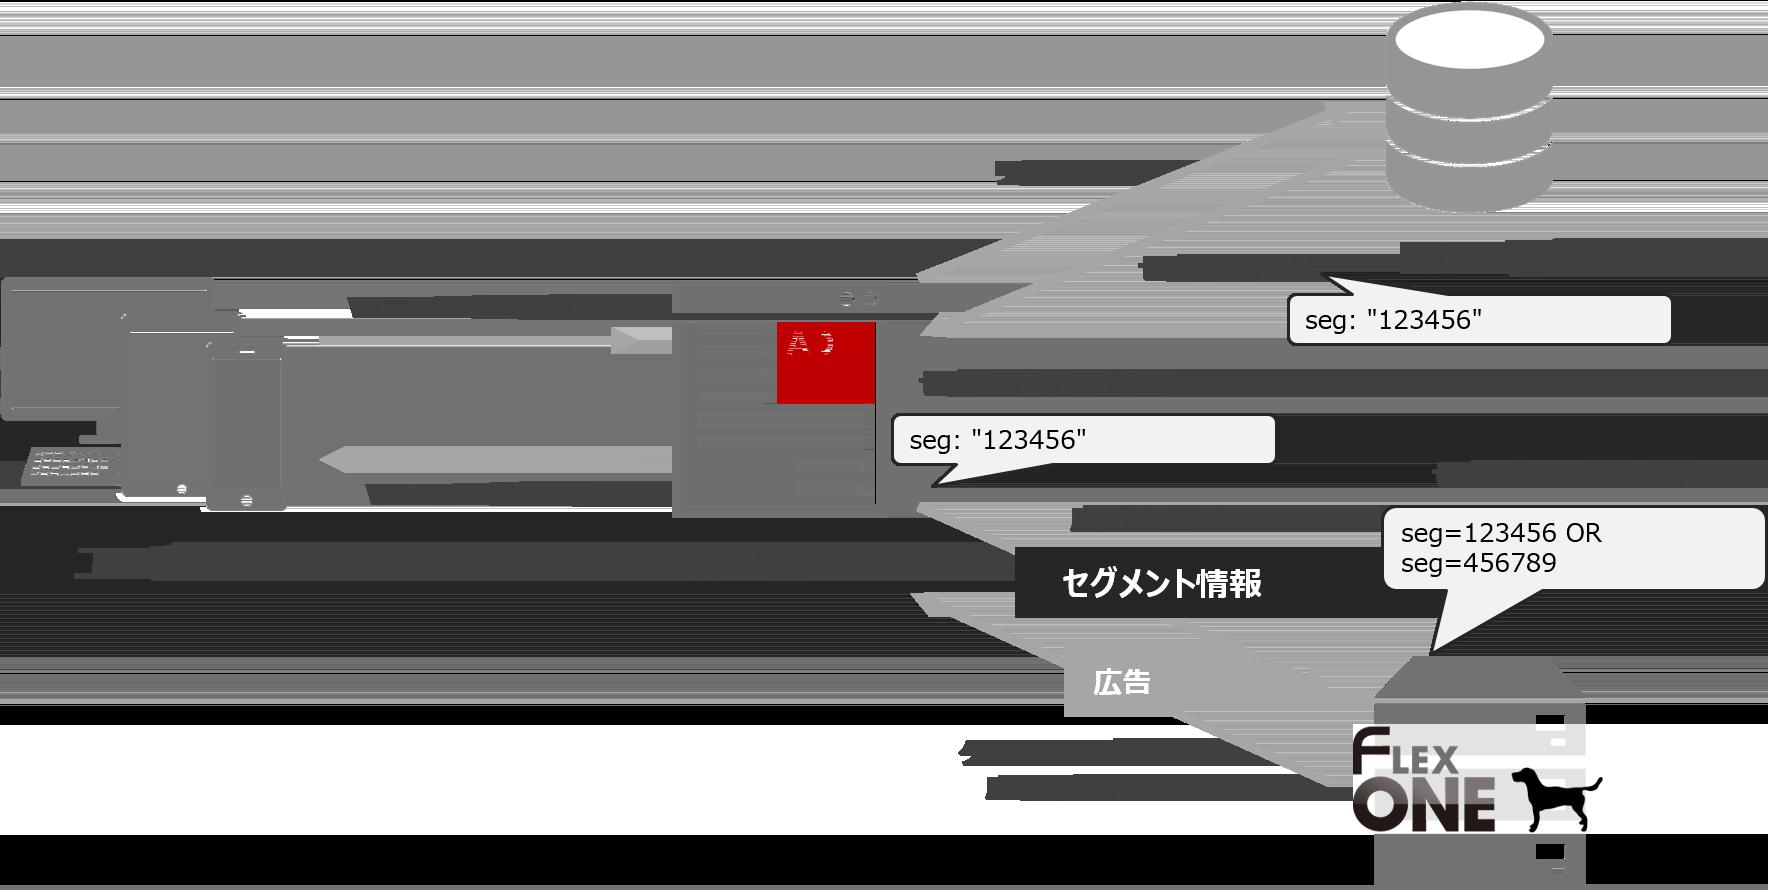 flexone-custom-targeting-image8